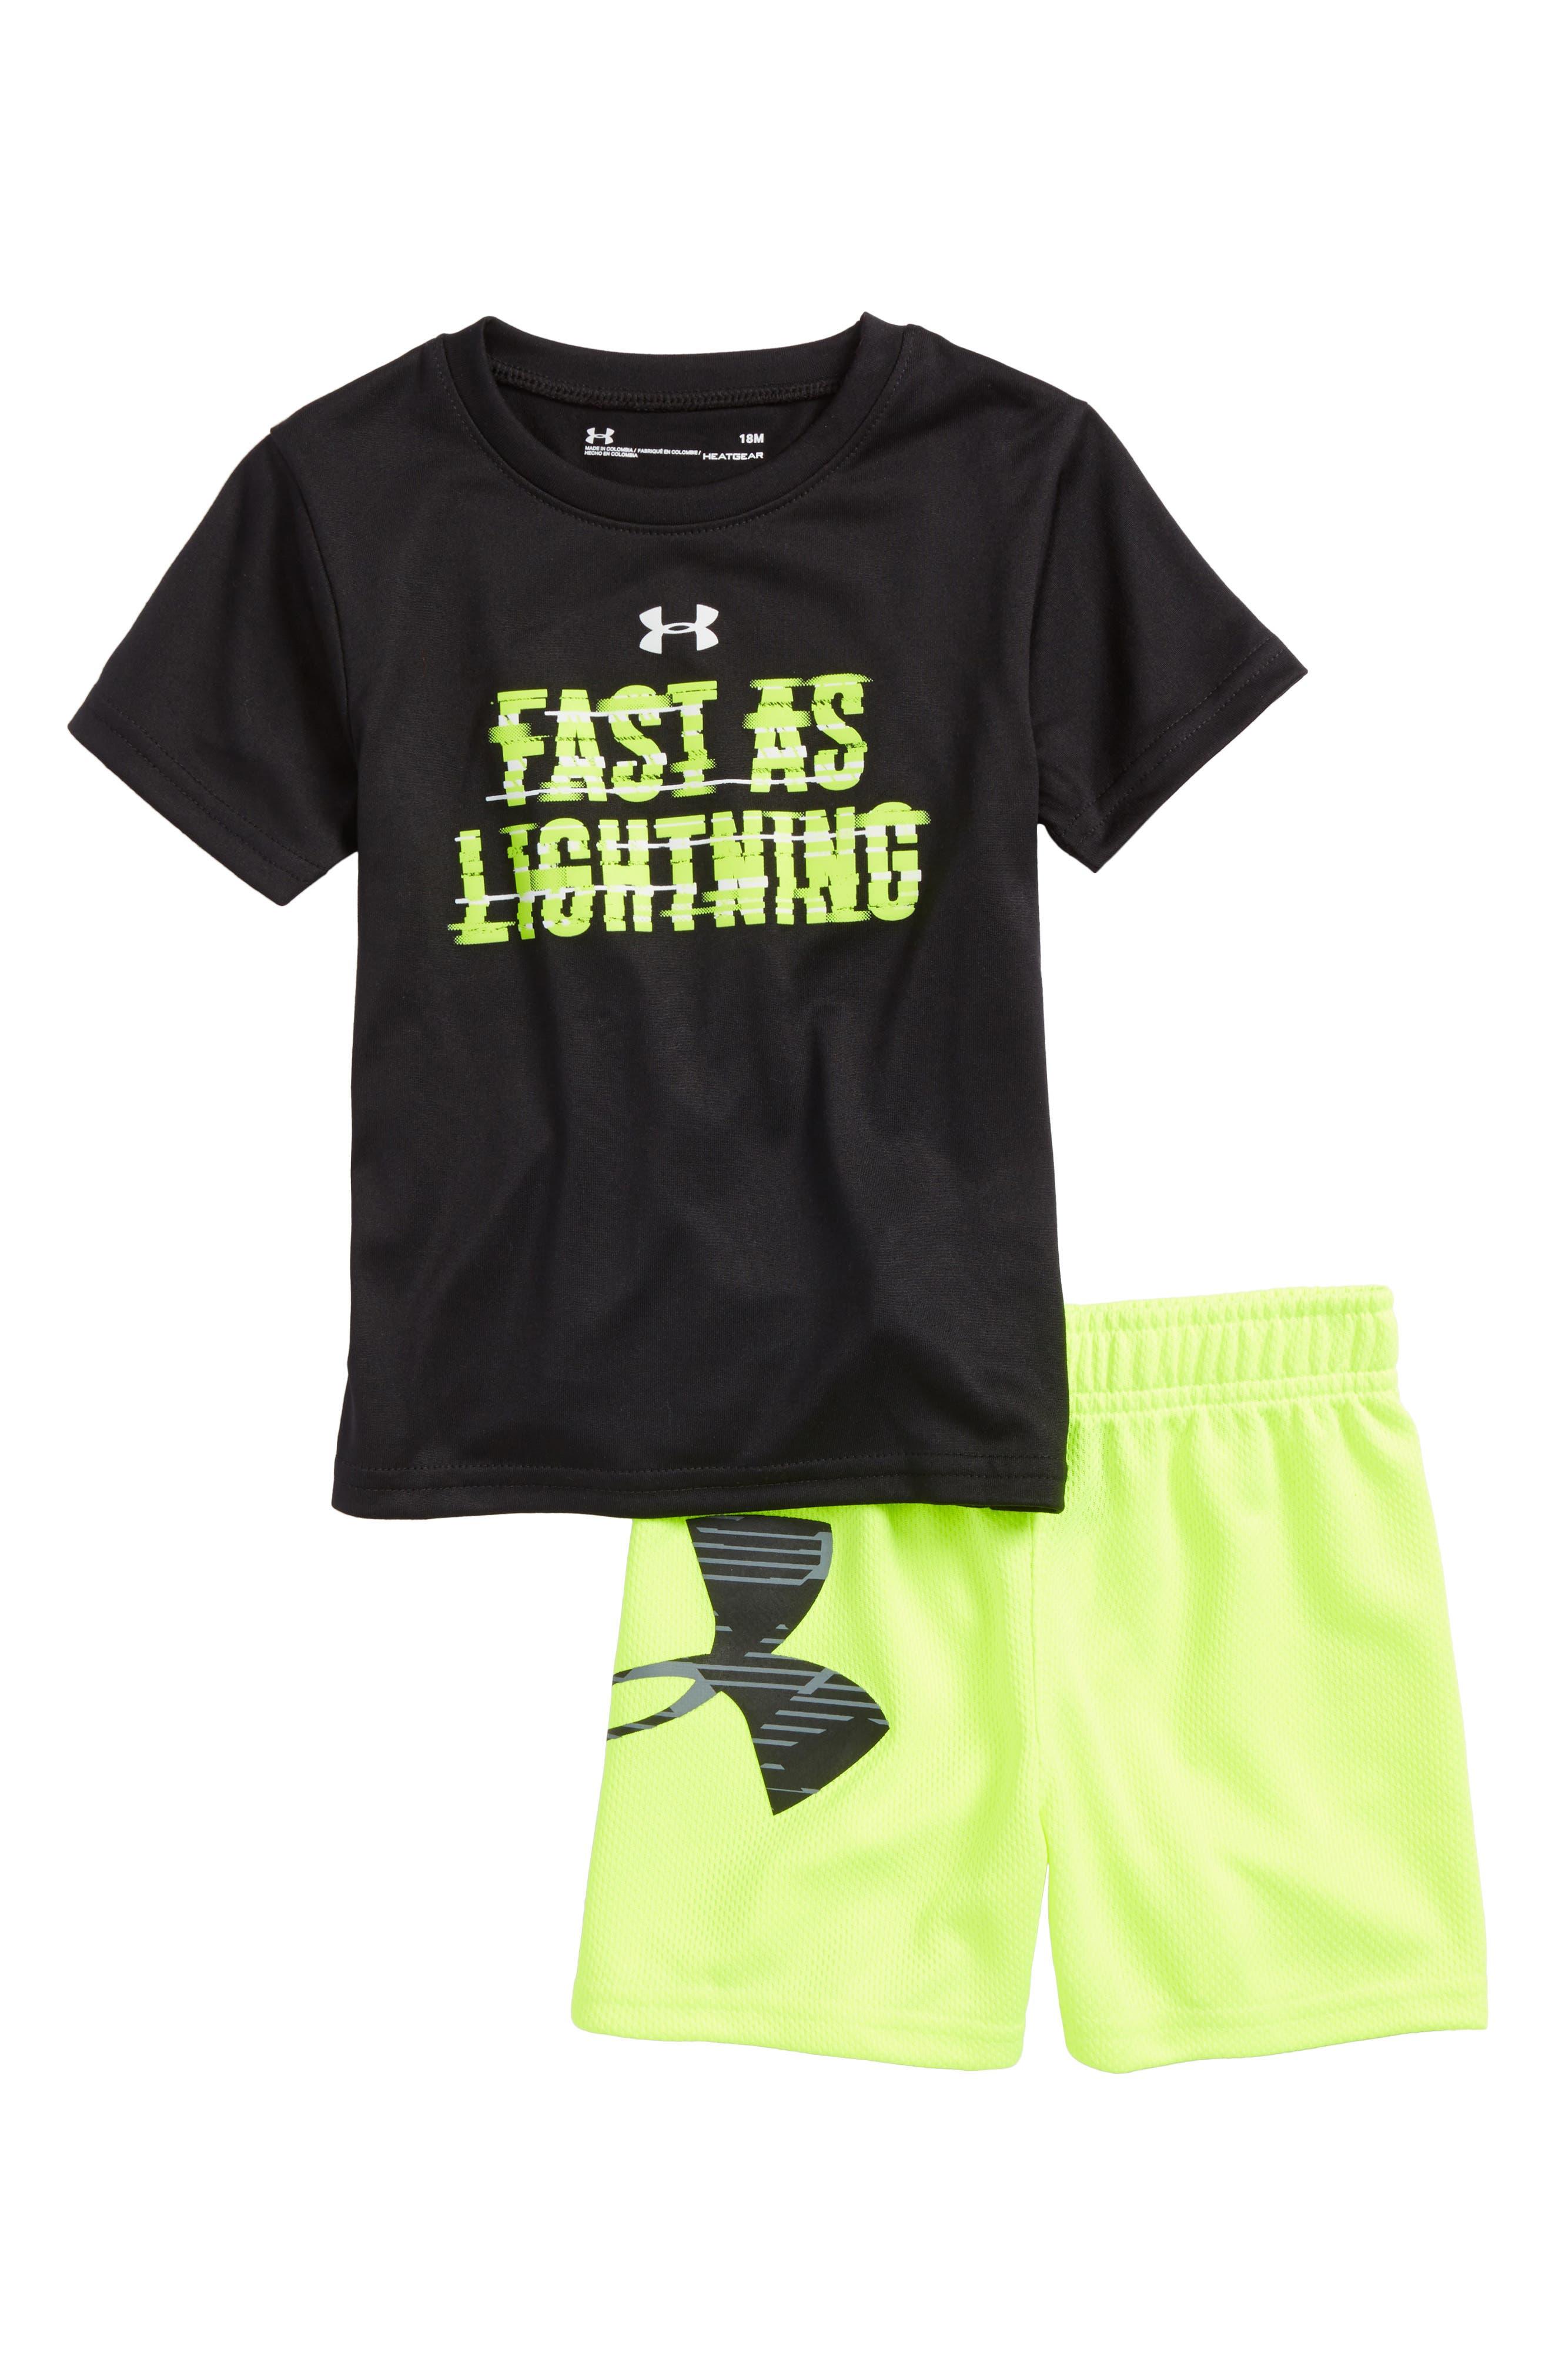 Fast As Lightning Shirt & Shorts Set,                             Main thumbnail 1, color,                             Black